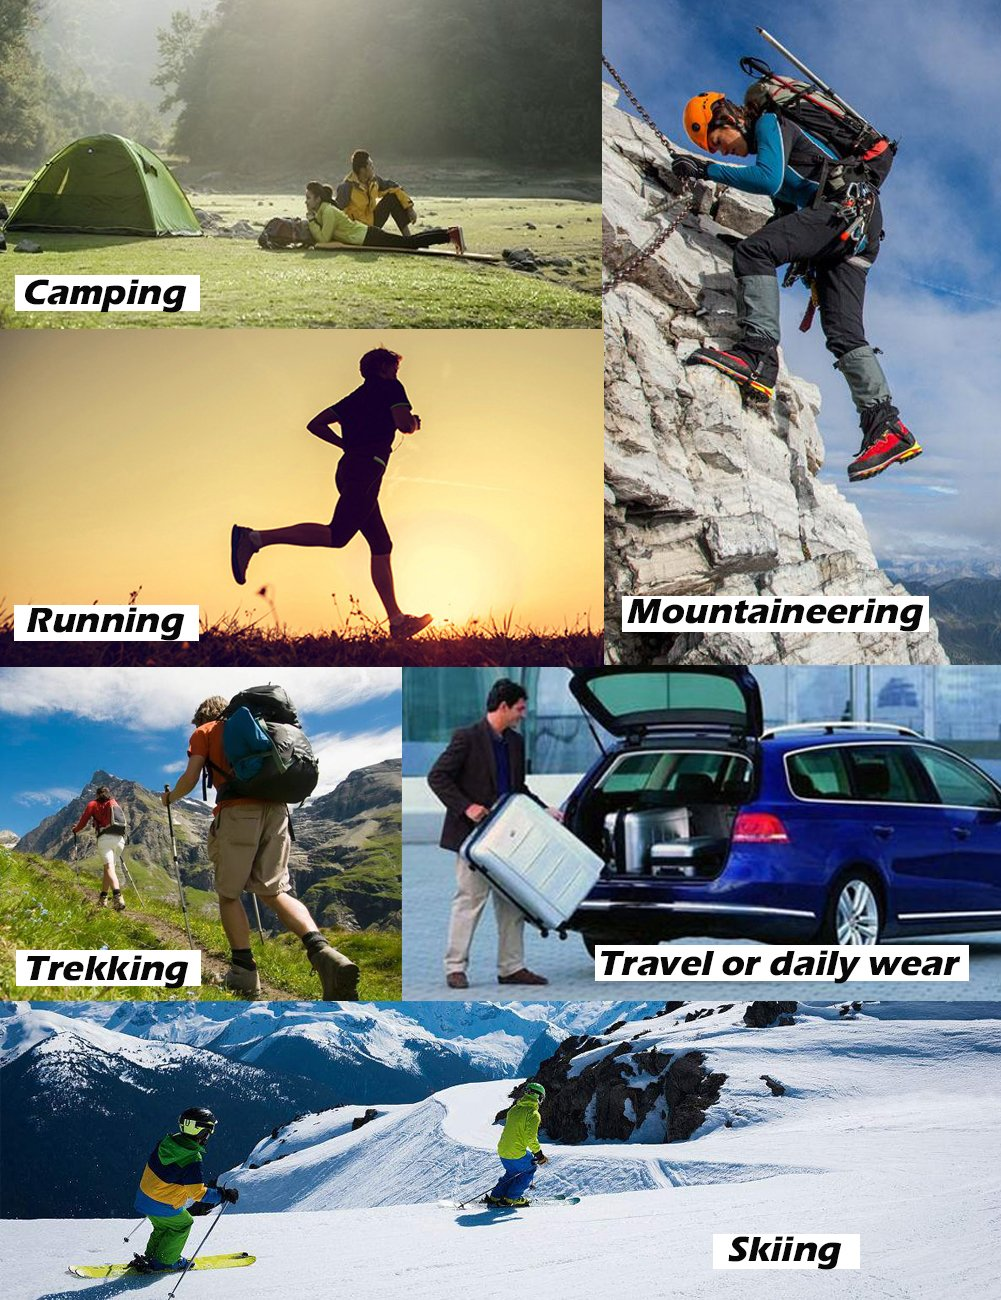 SUDILO Crew Cushion Hiking Trekking Socks,Coolmax Multi Performance Antiskid Wicking Outdoor Athletic Socks by SUDILO (Image #7)